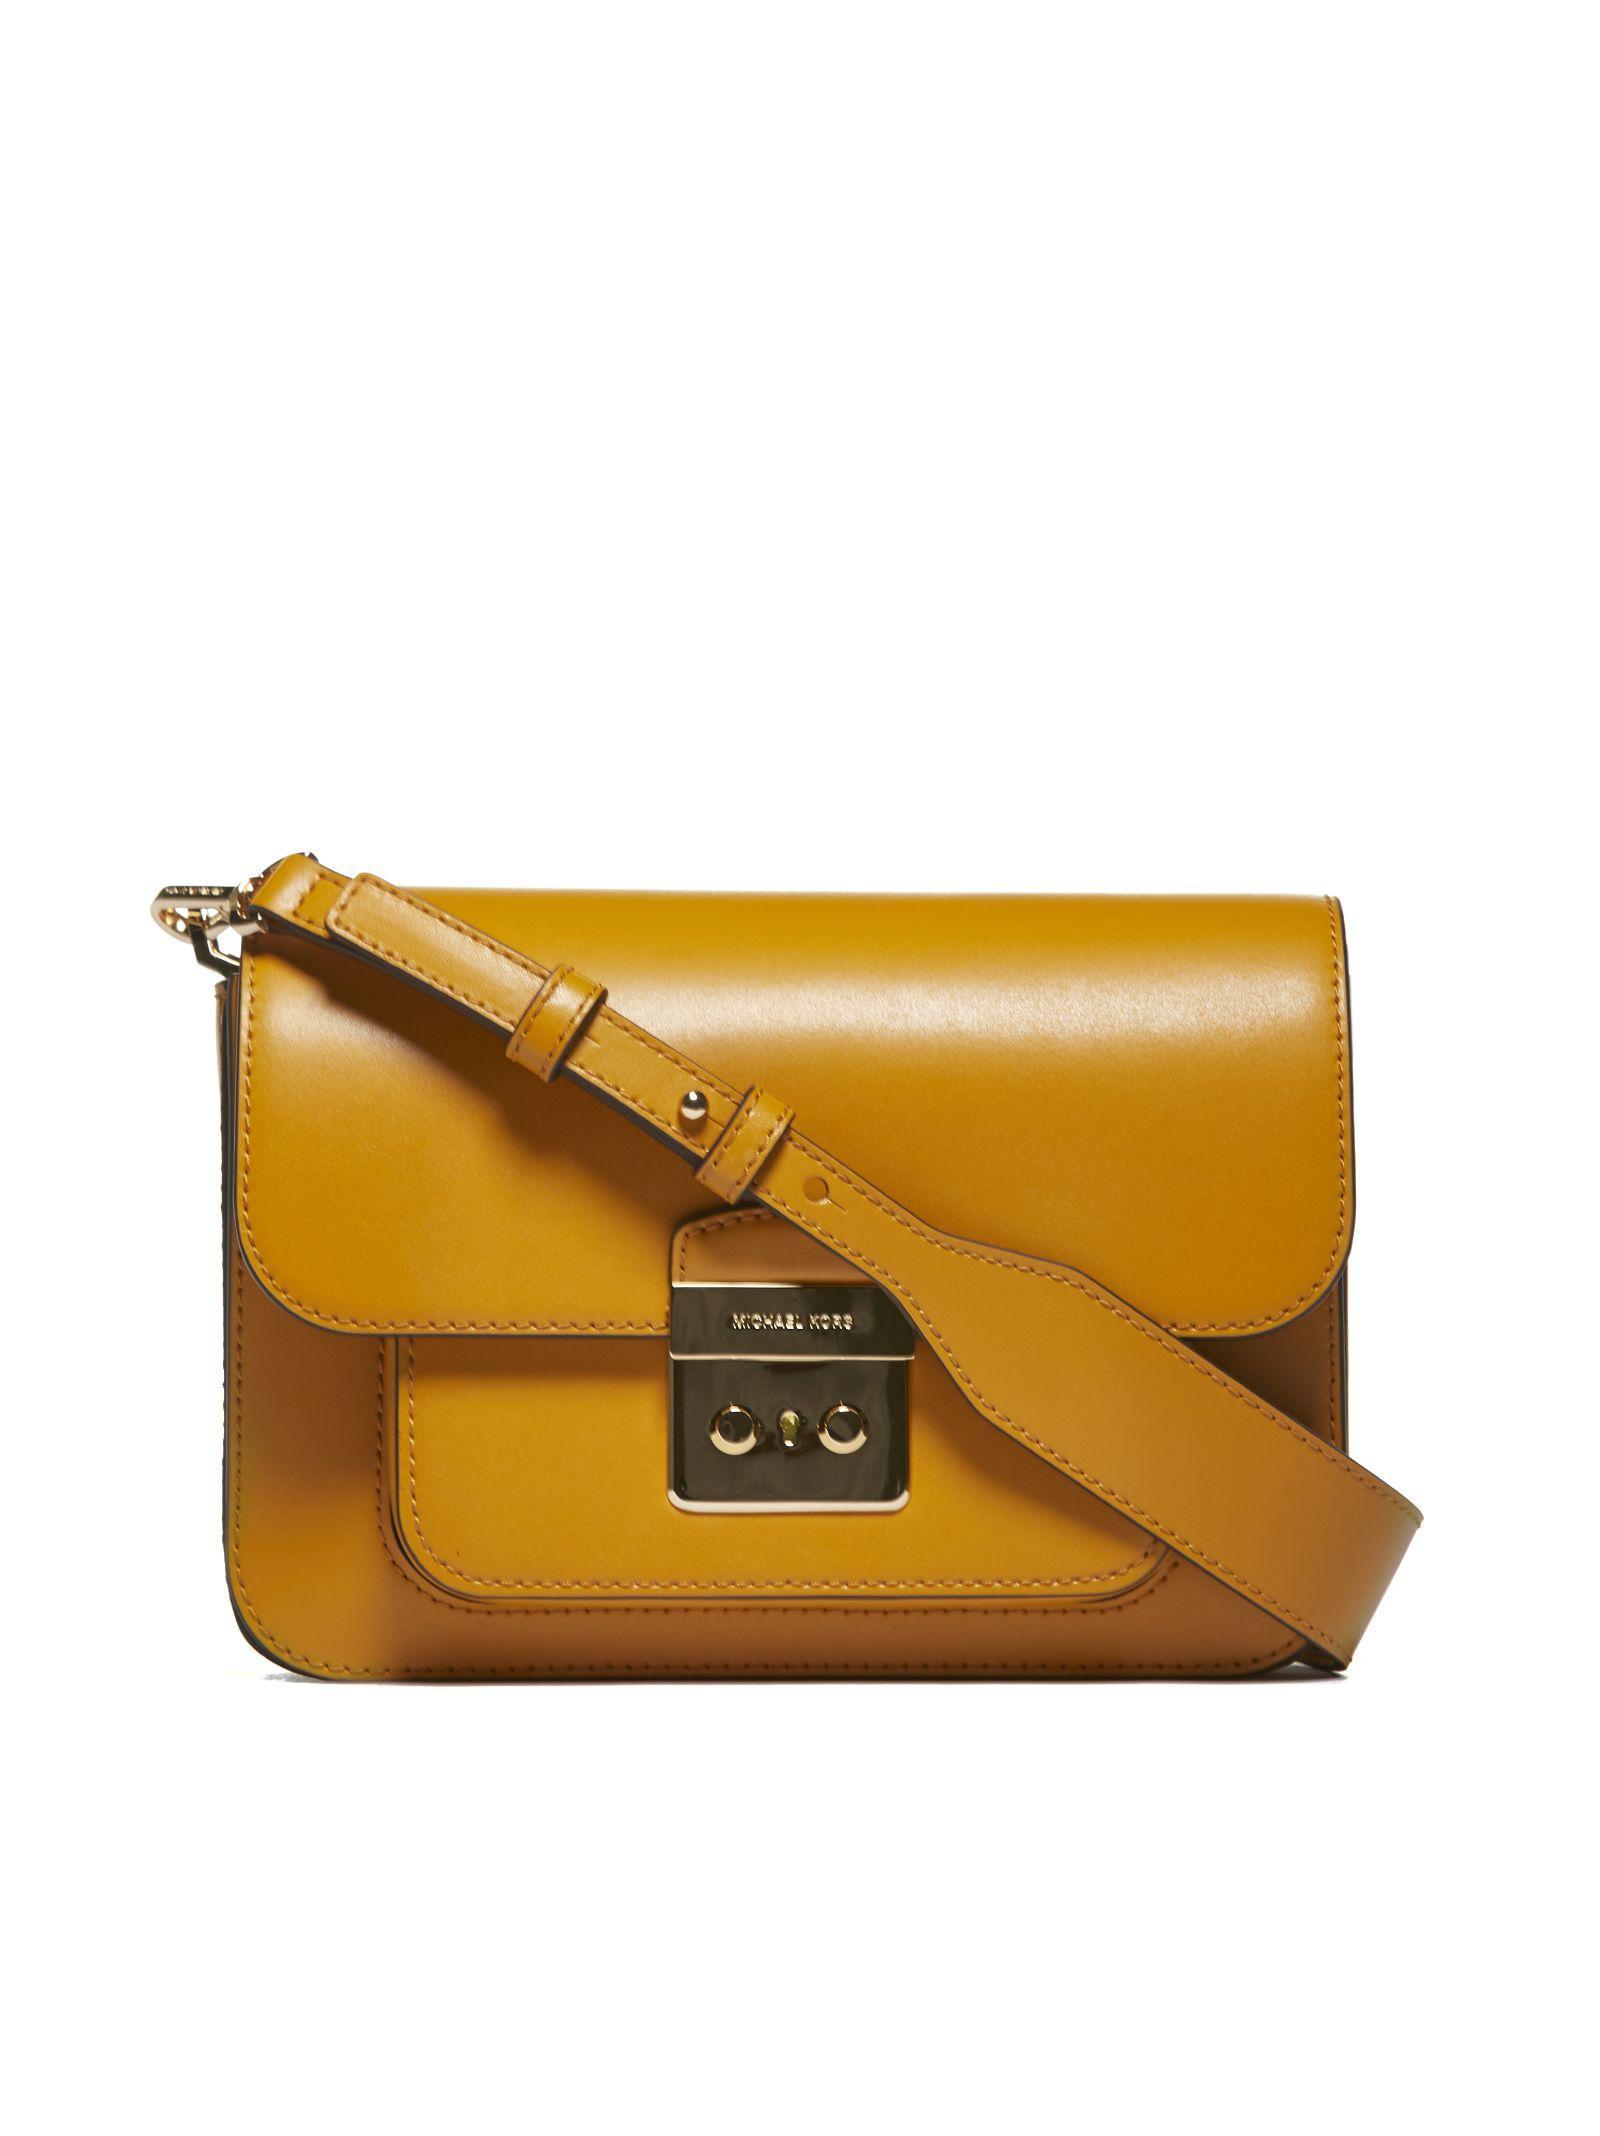 4e5c10b7d9b5 Michael Michael Kors Sloan Editor Shoulder Bag In Giallo Oro